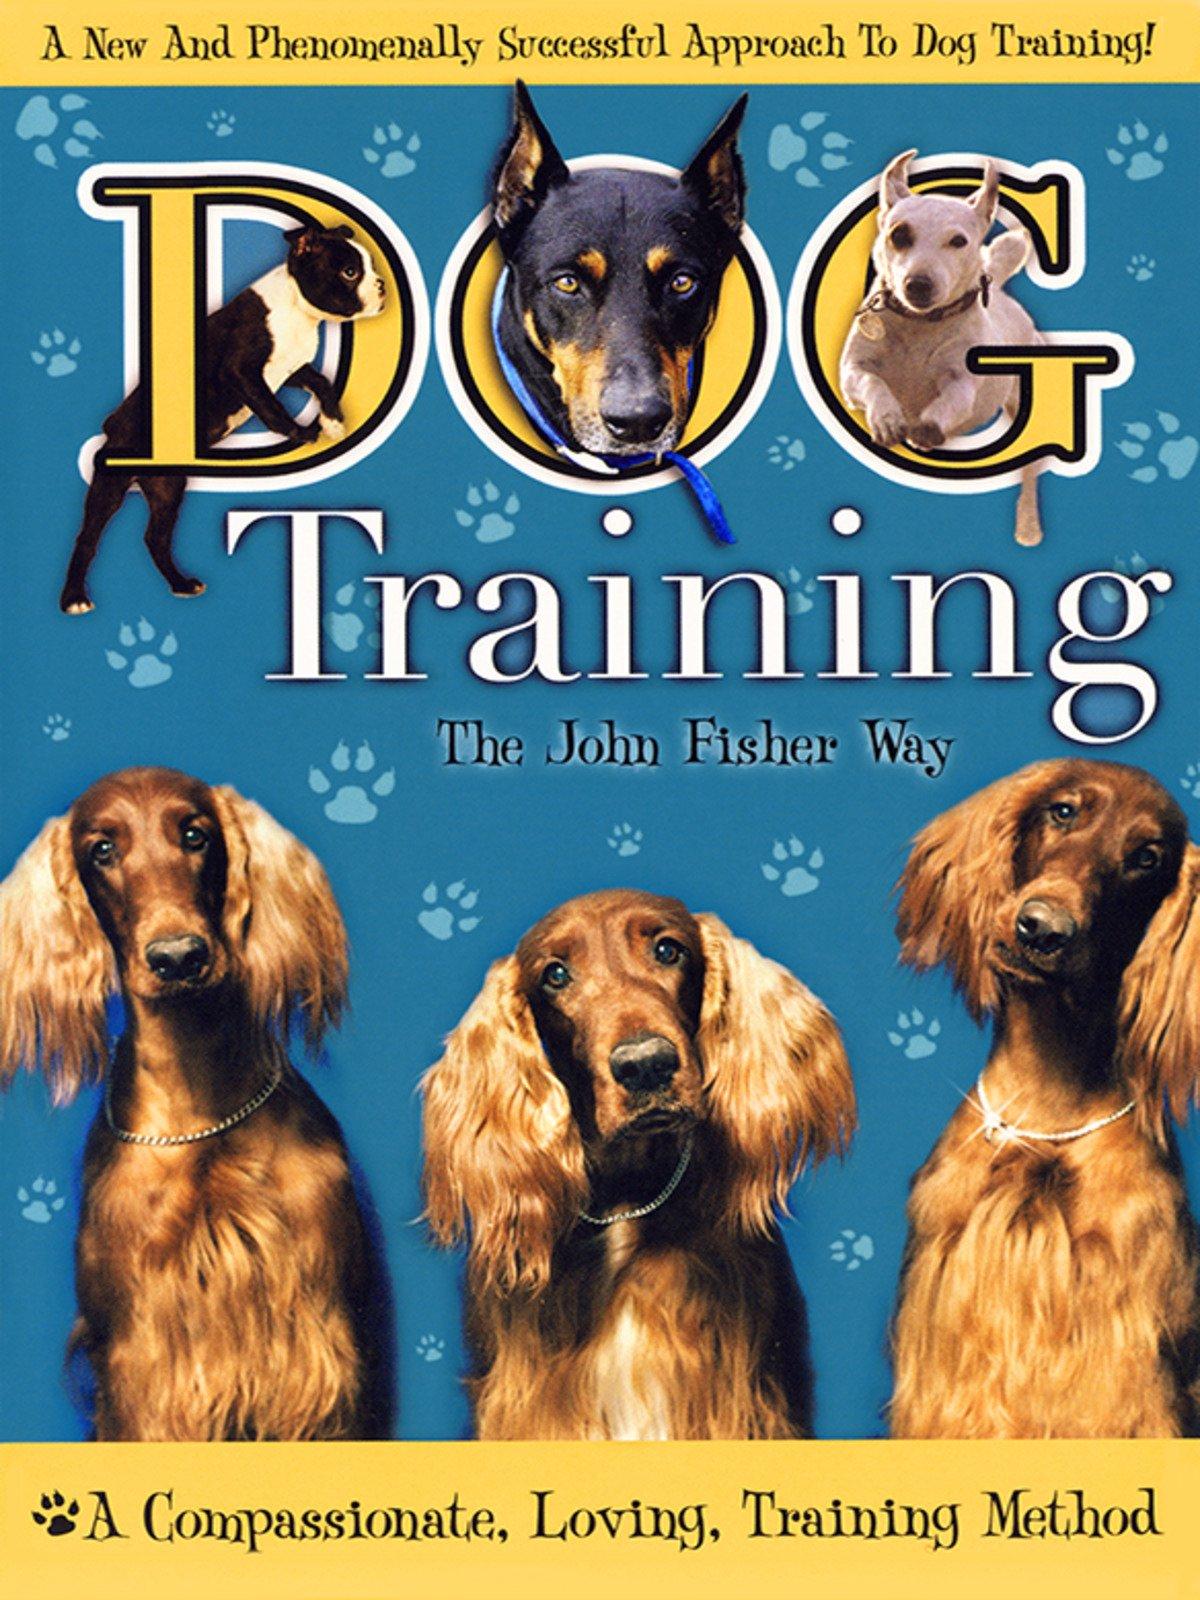 Dog Training: The John Fisher Way